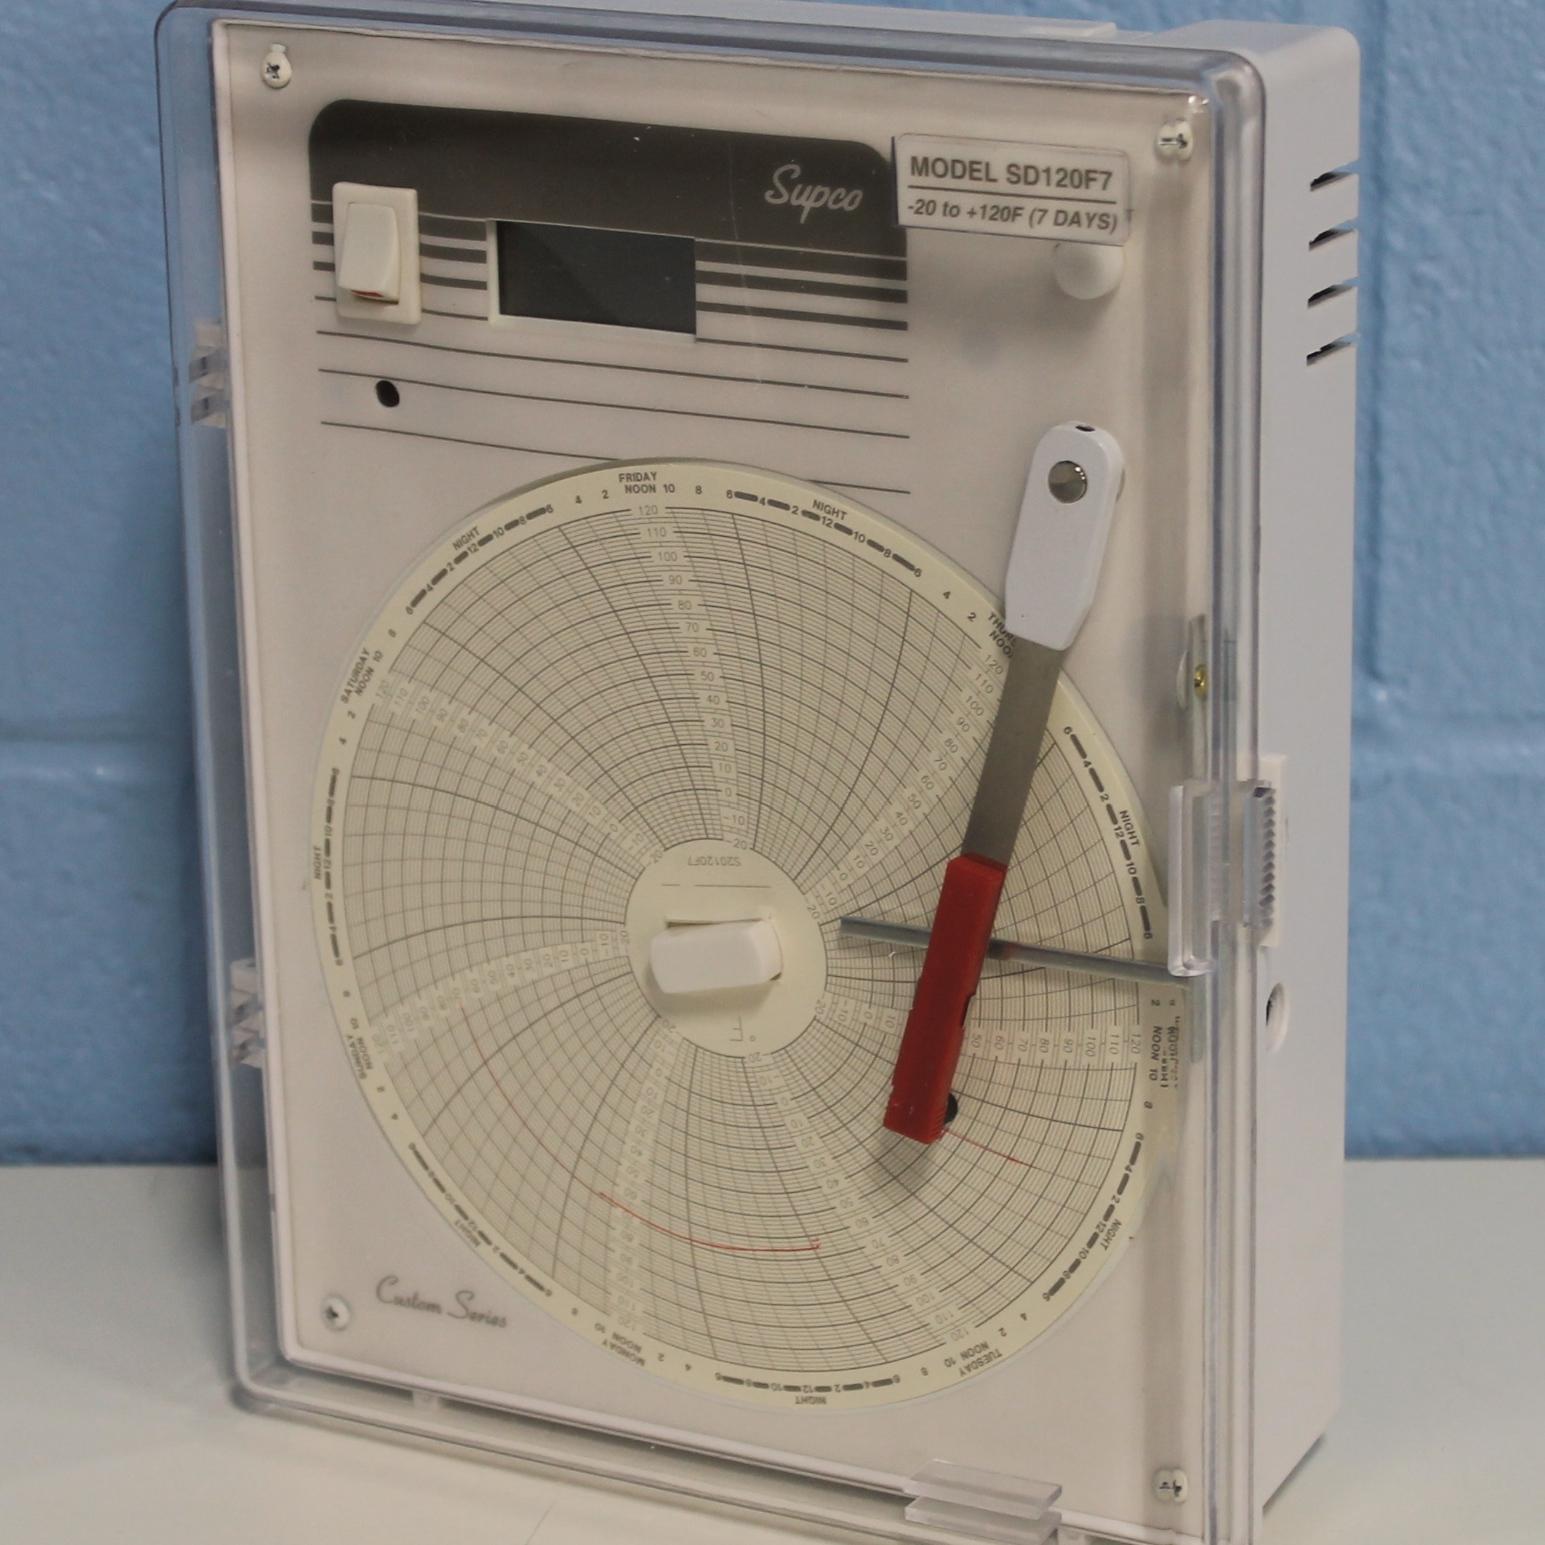 Supco SD120F7 Temperature Recorder W/ Digital Display Image